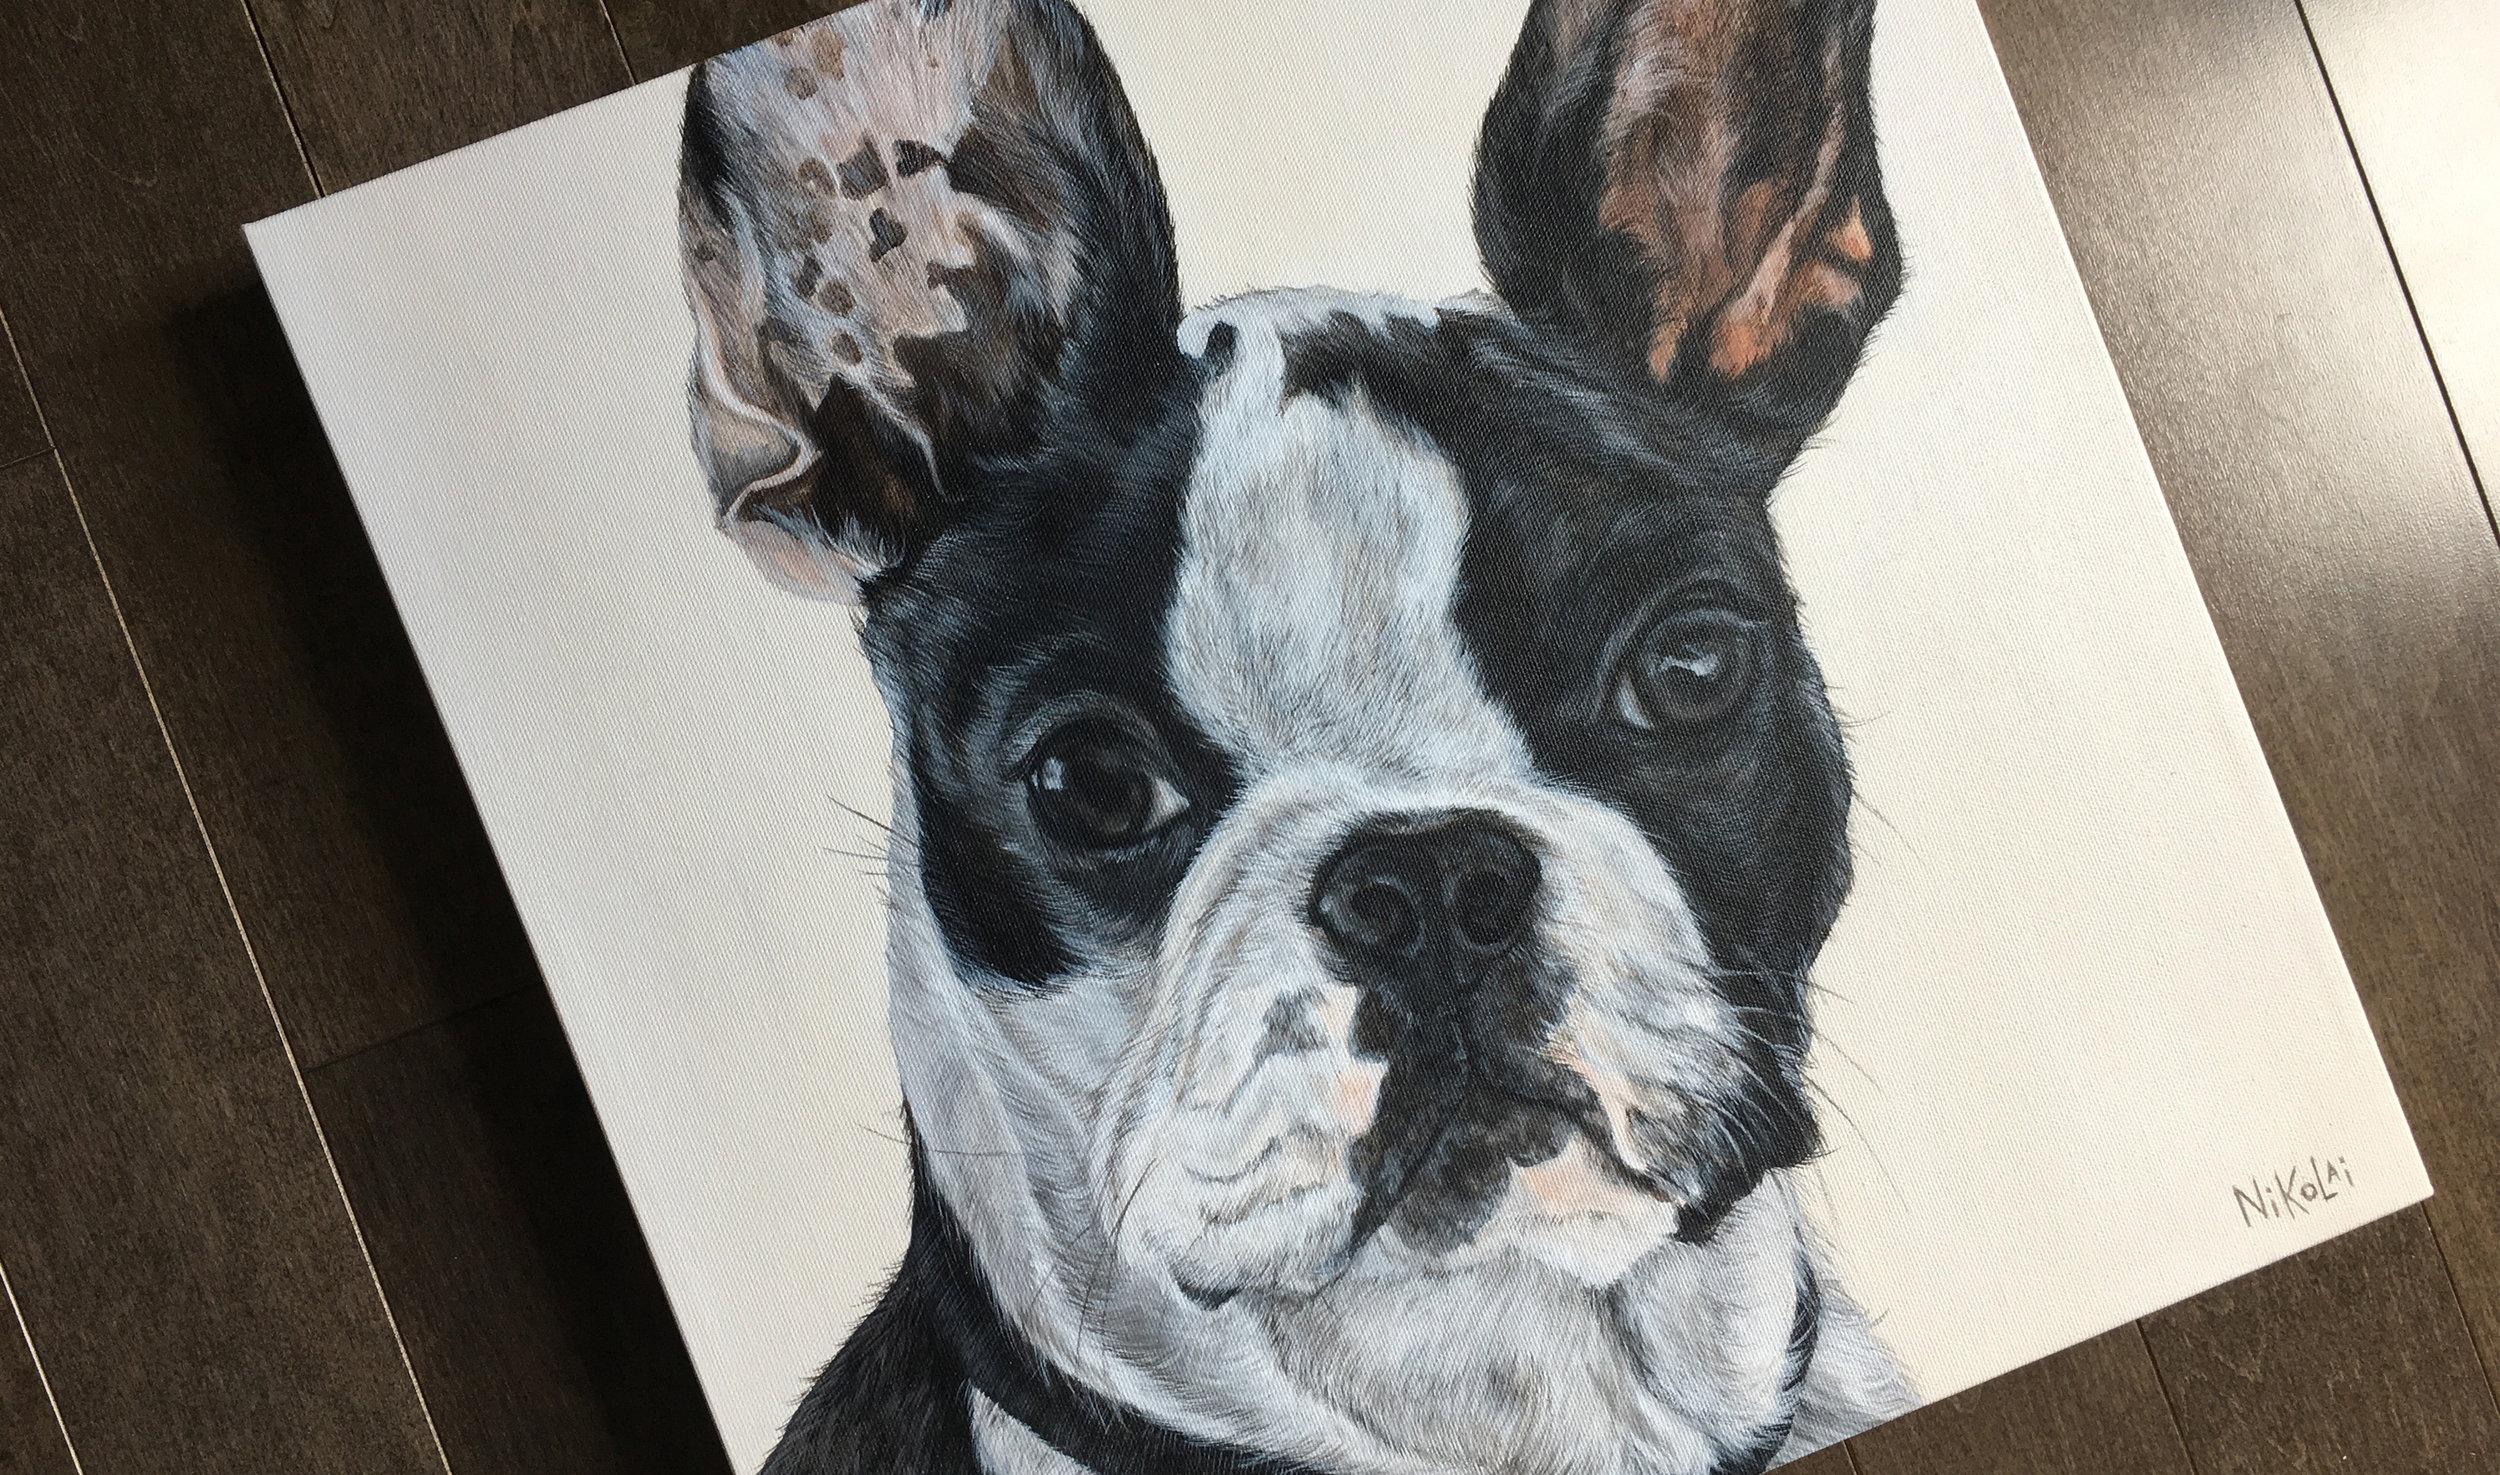 Yoda (Boston Terrier) Portrait Painting